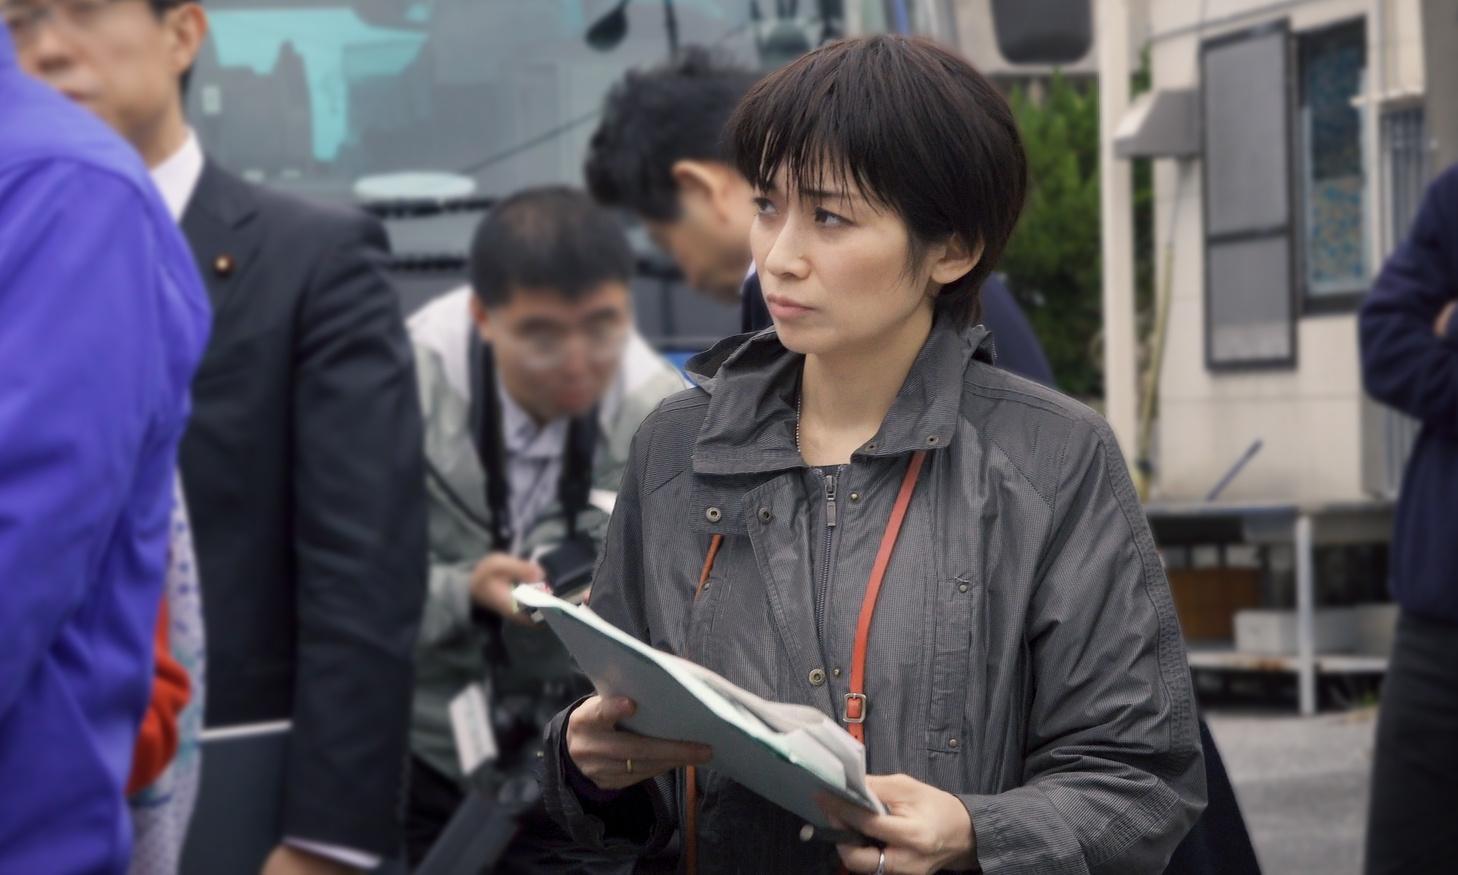 Isoko Mochizuki, the 'troublesome' thorn in Shinzo Abe's side